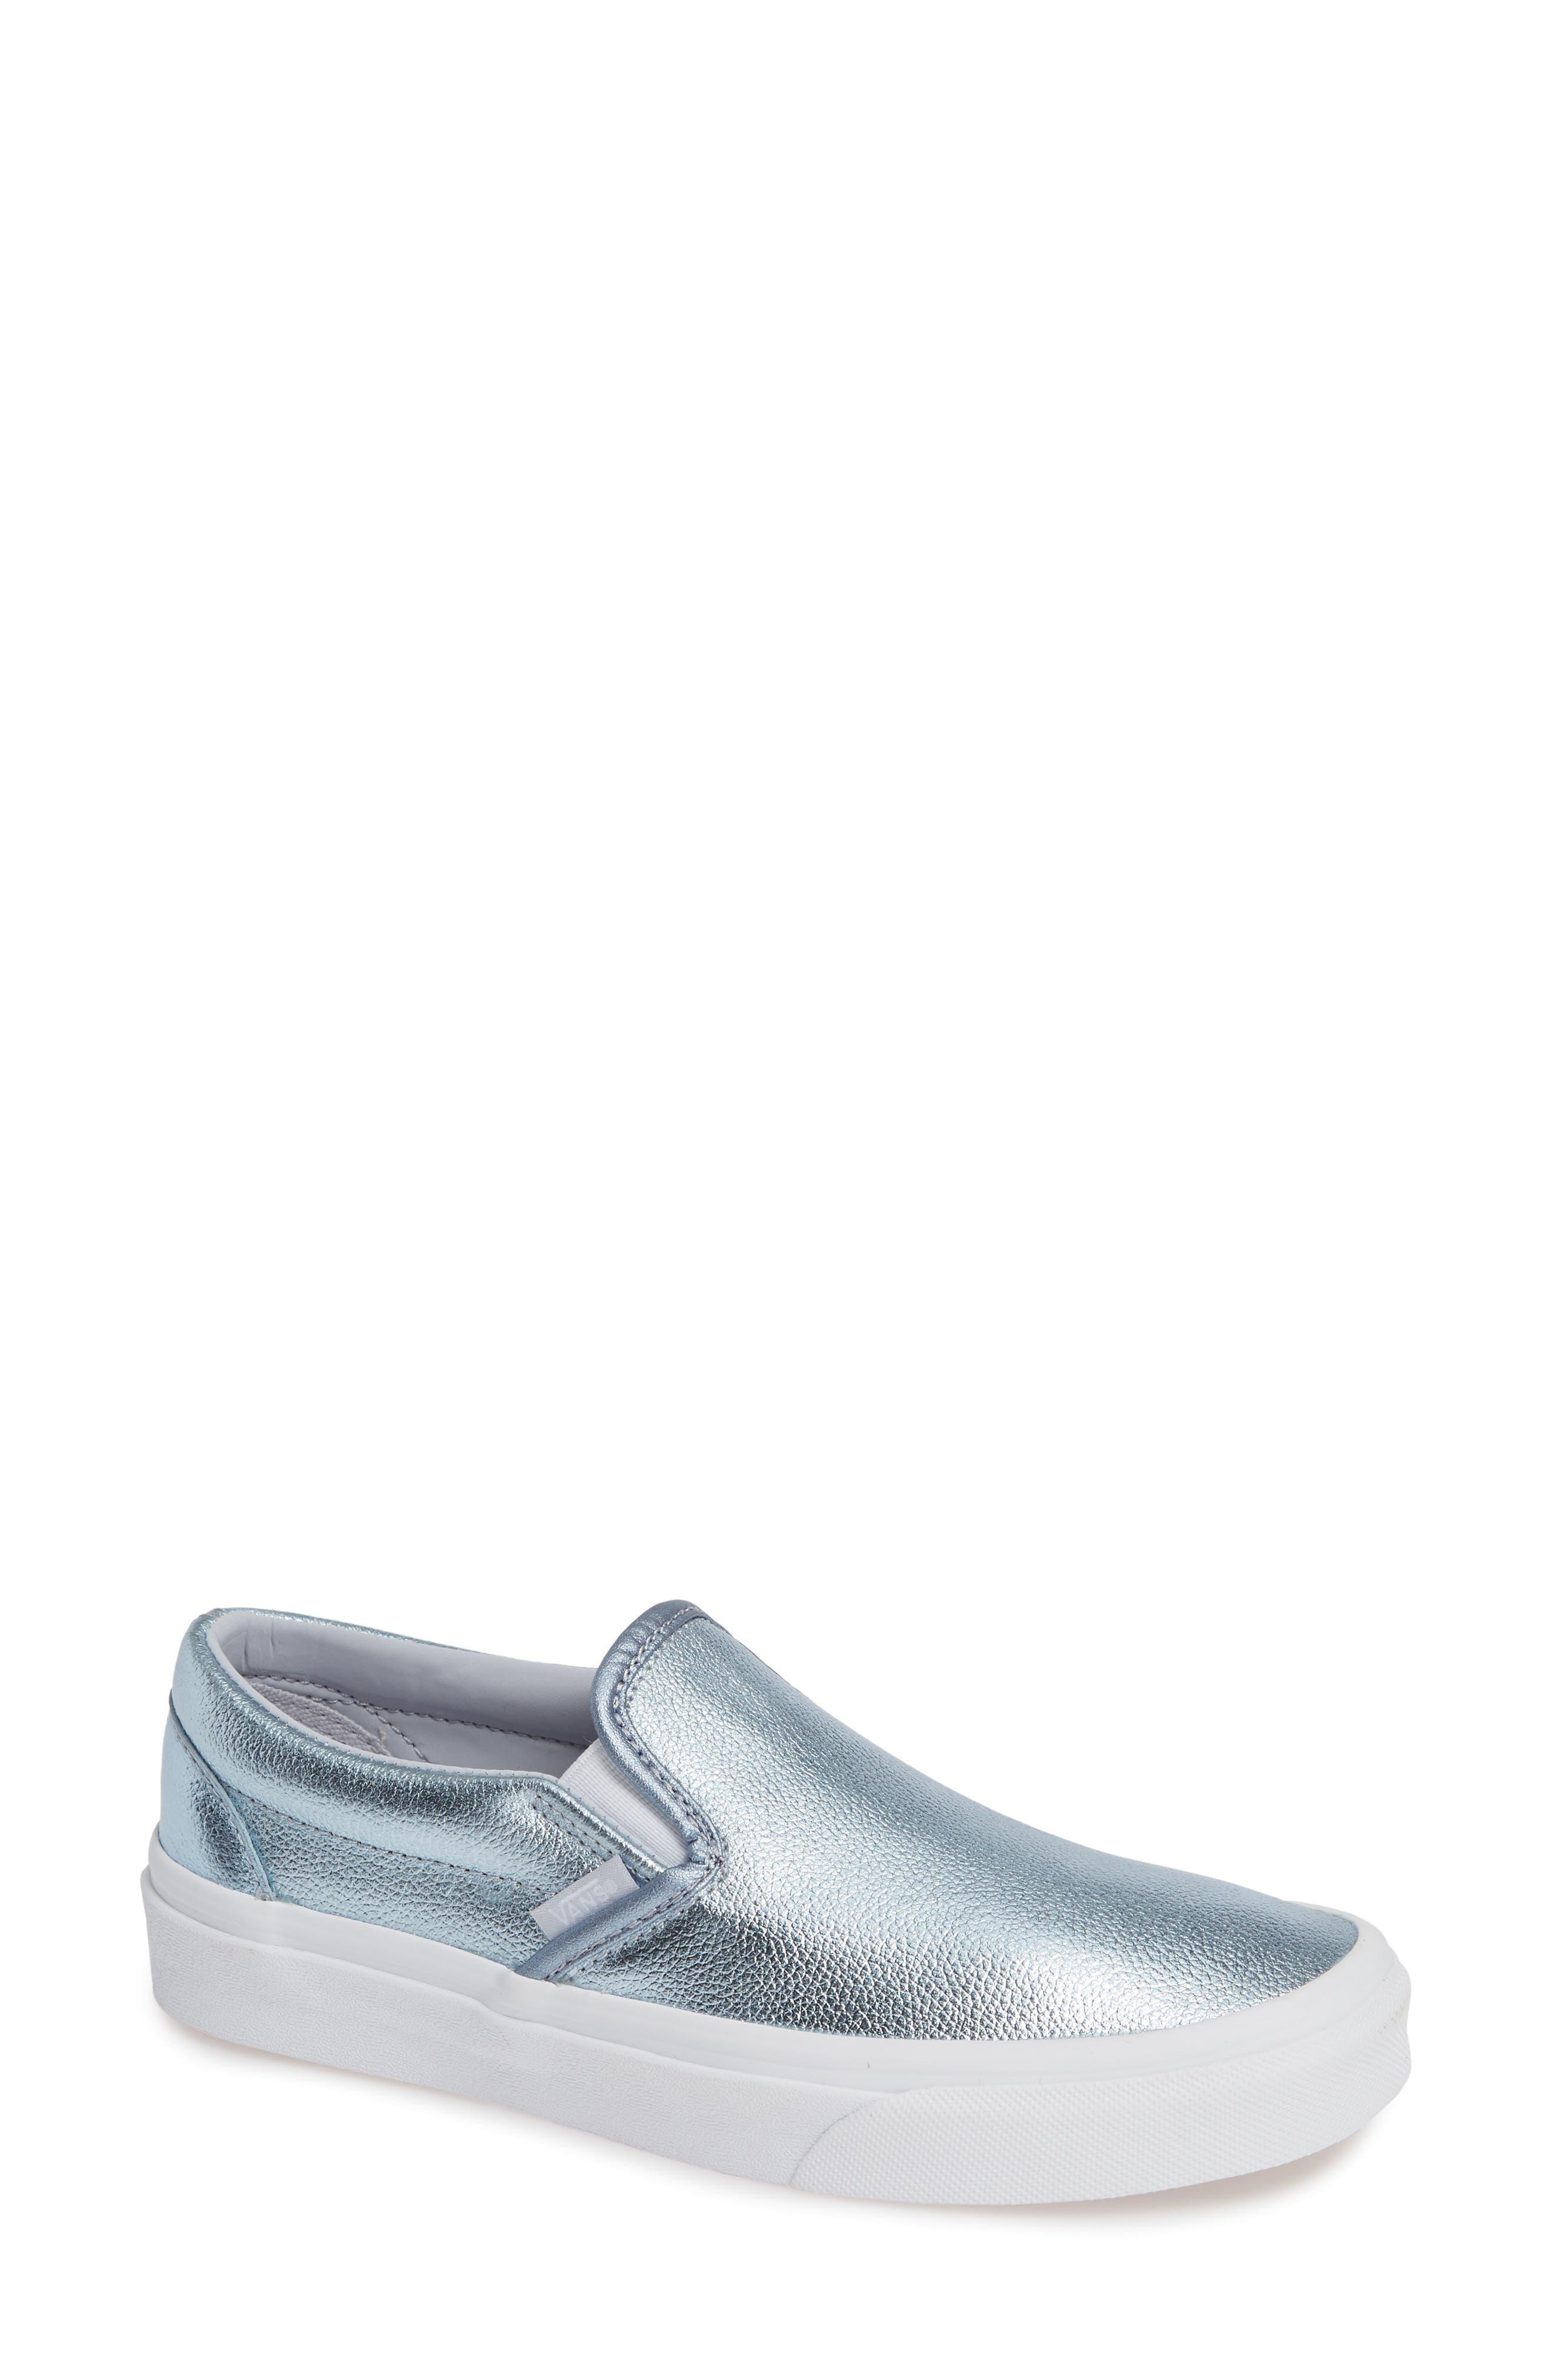 ,                             Classic Slip-On Sneaker,                             Main thumbnail 35, color,                             402